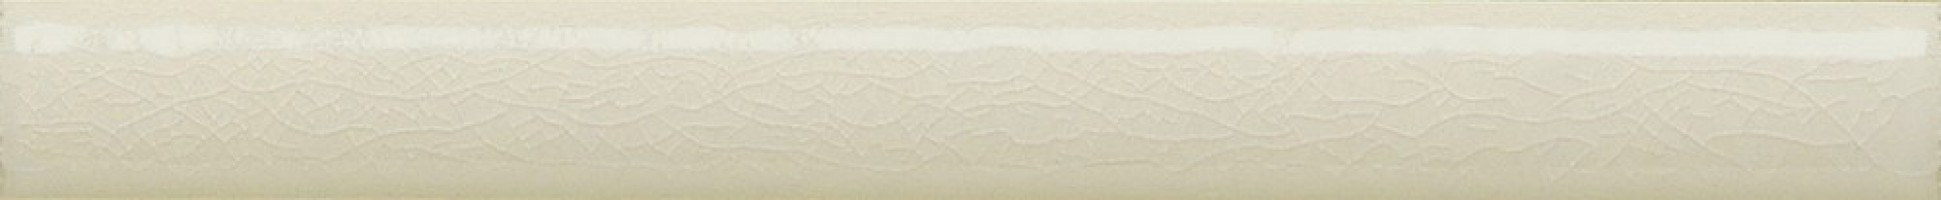 Бордюр Elios Ceramica Wine Country Bar Liner Ivory 1.5x15